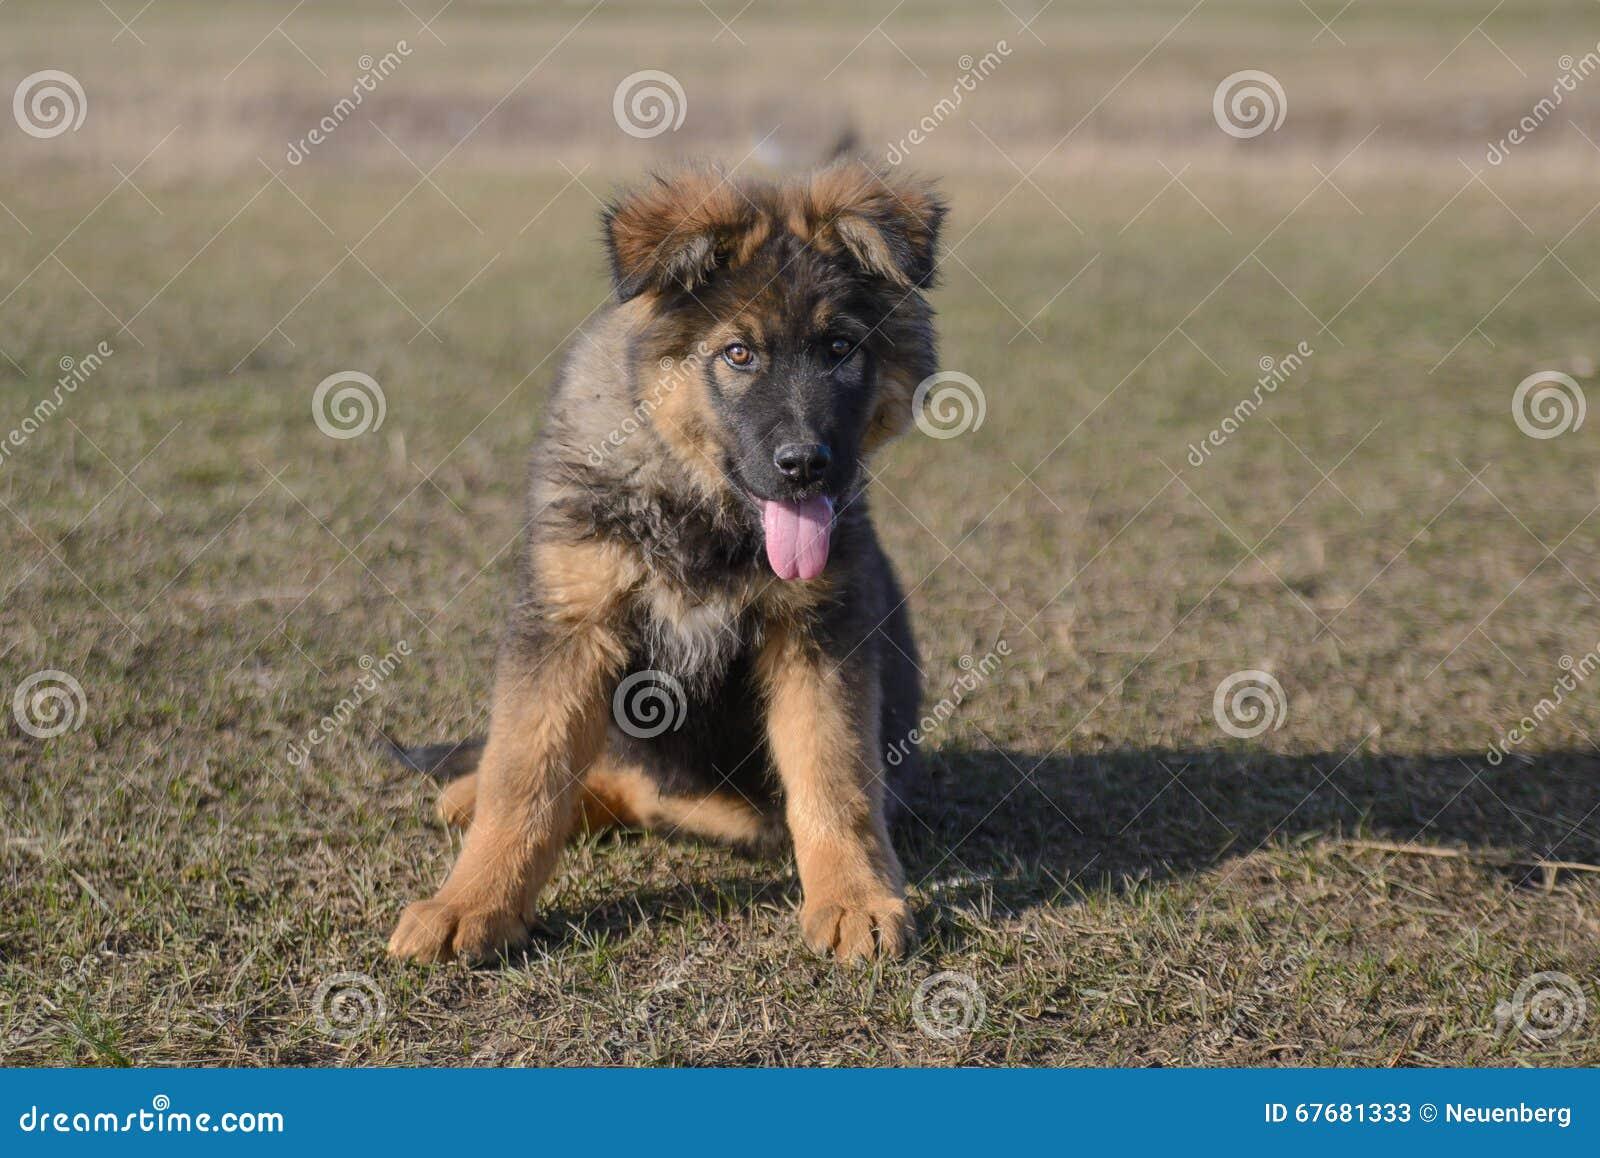 German Shepherd Puppy Stock Image Image Of Smart Spring 67681333